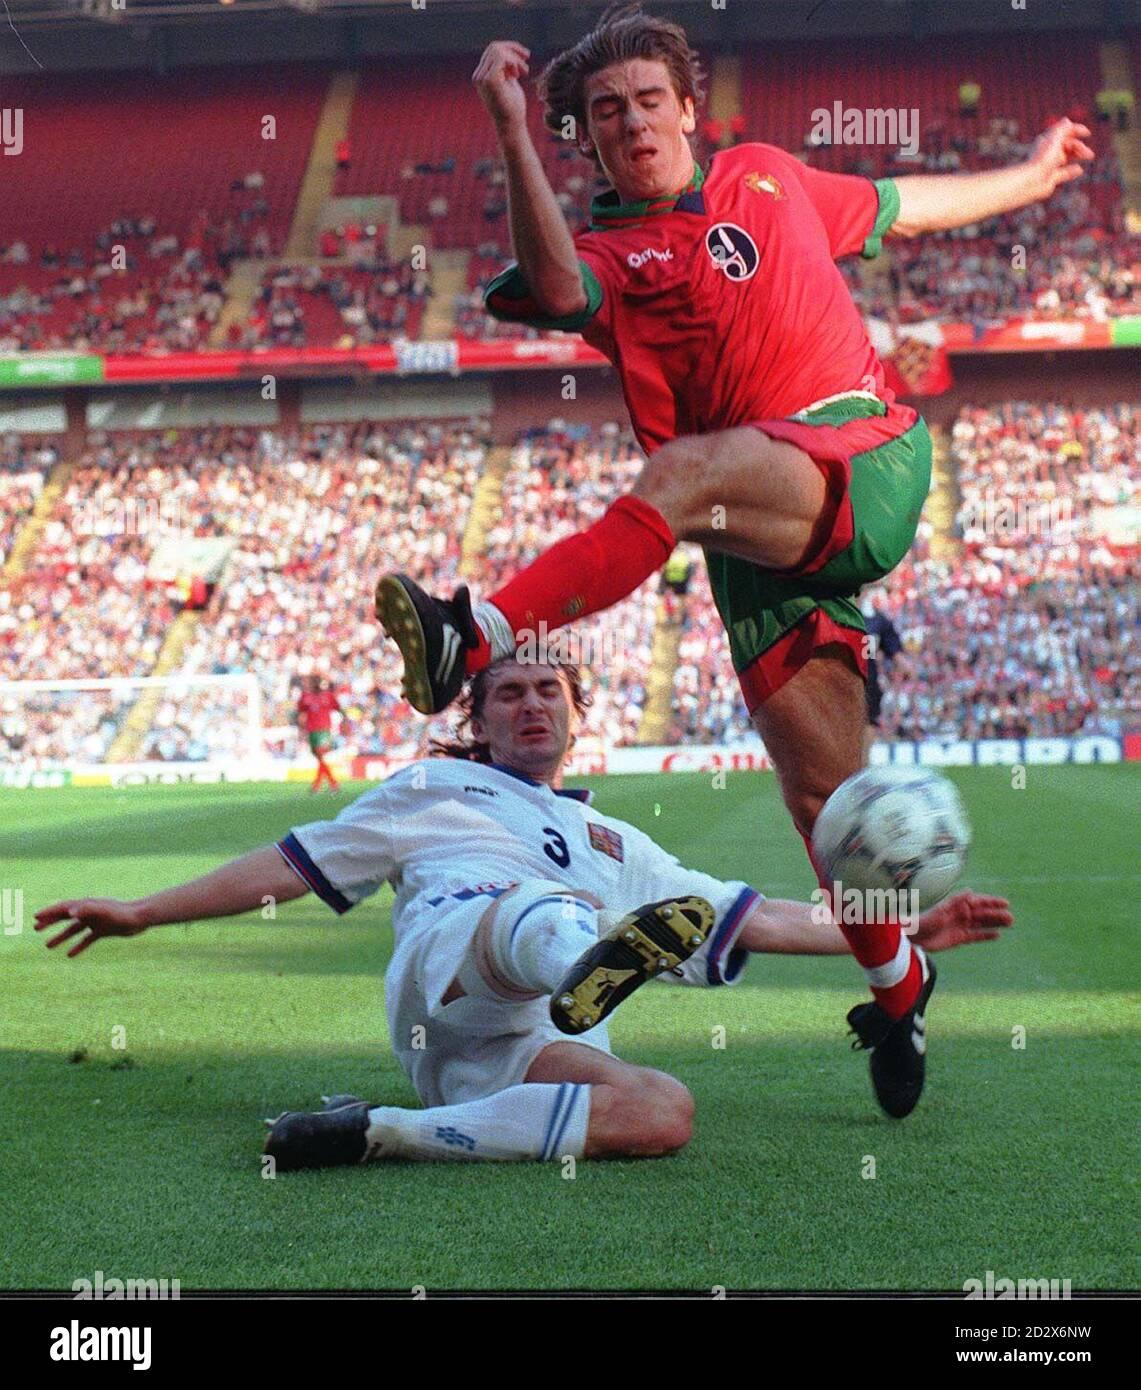 Czech Republic's Jan Suchoparek intercepts as Portugal's Ricardo Sa Pinto tries to cross into the goal area during tonight's Euro 96 Quarter final at Villa Park. Picture DAVID JONES/PA Stock Photo